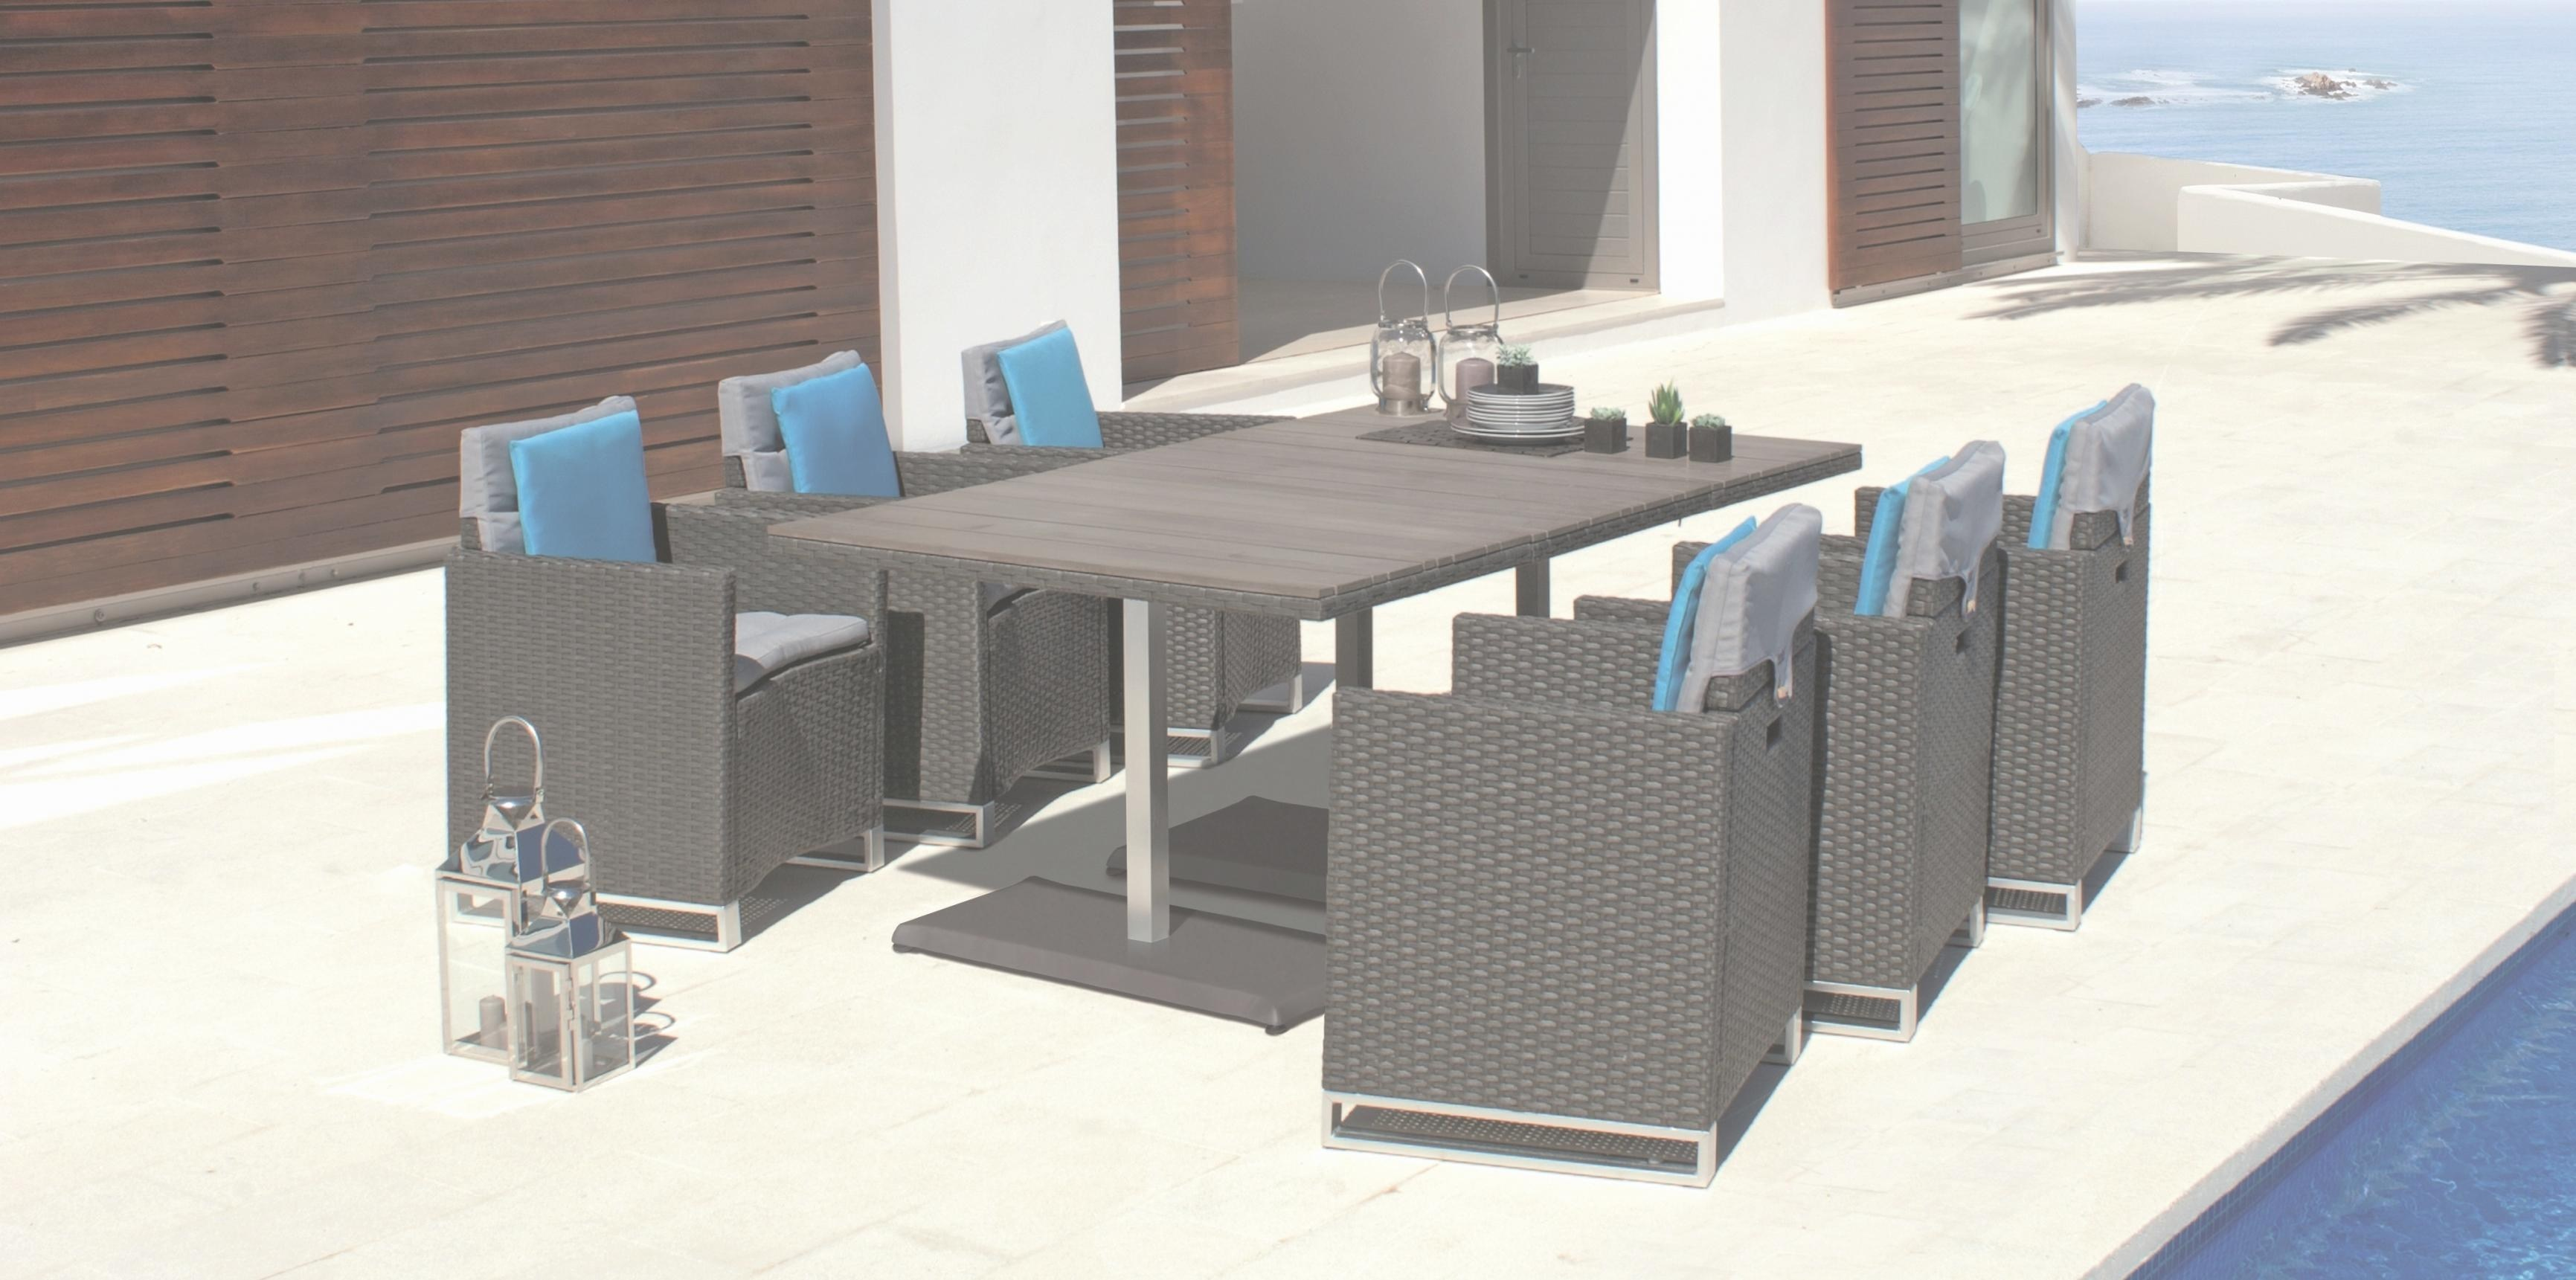 salon de jardin carrefour tokyo jardin piscine et cabane. Black Bedroom Furniture Sets. Home Design Ideas